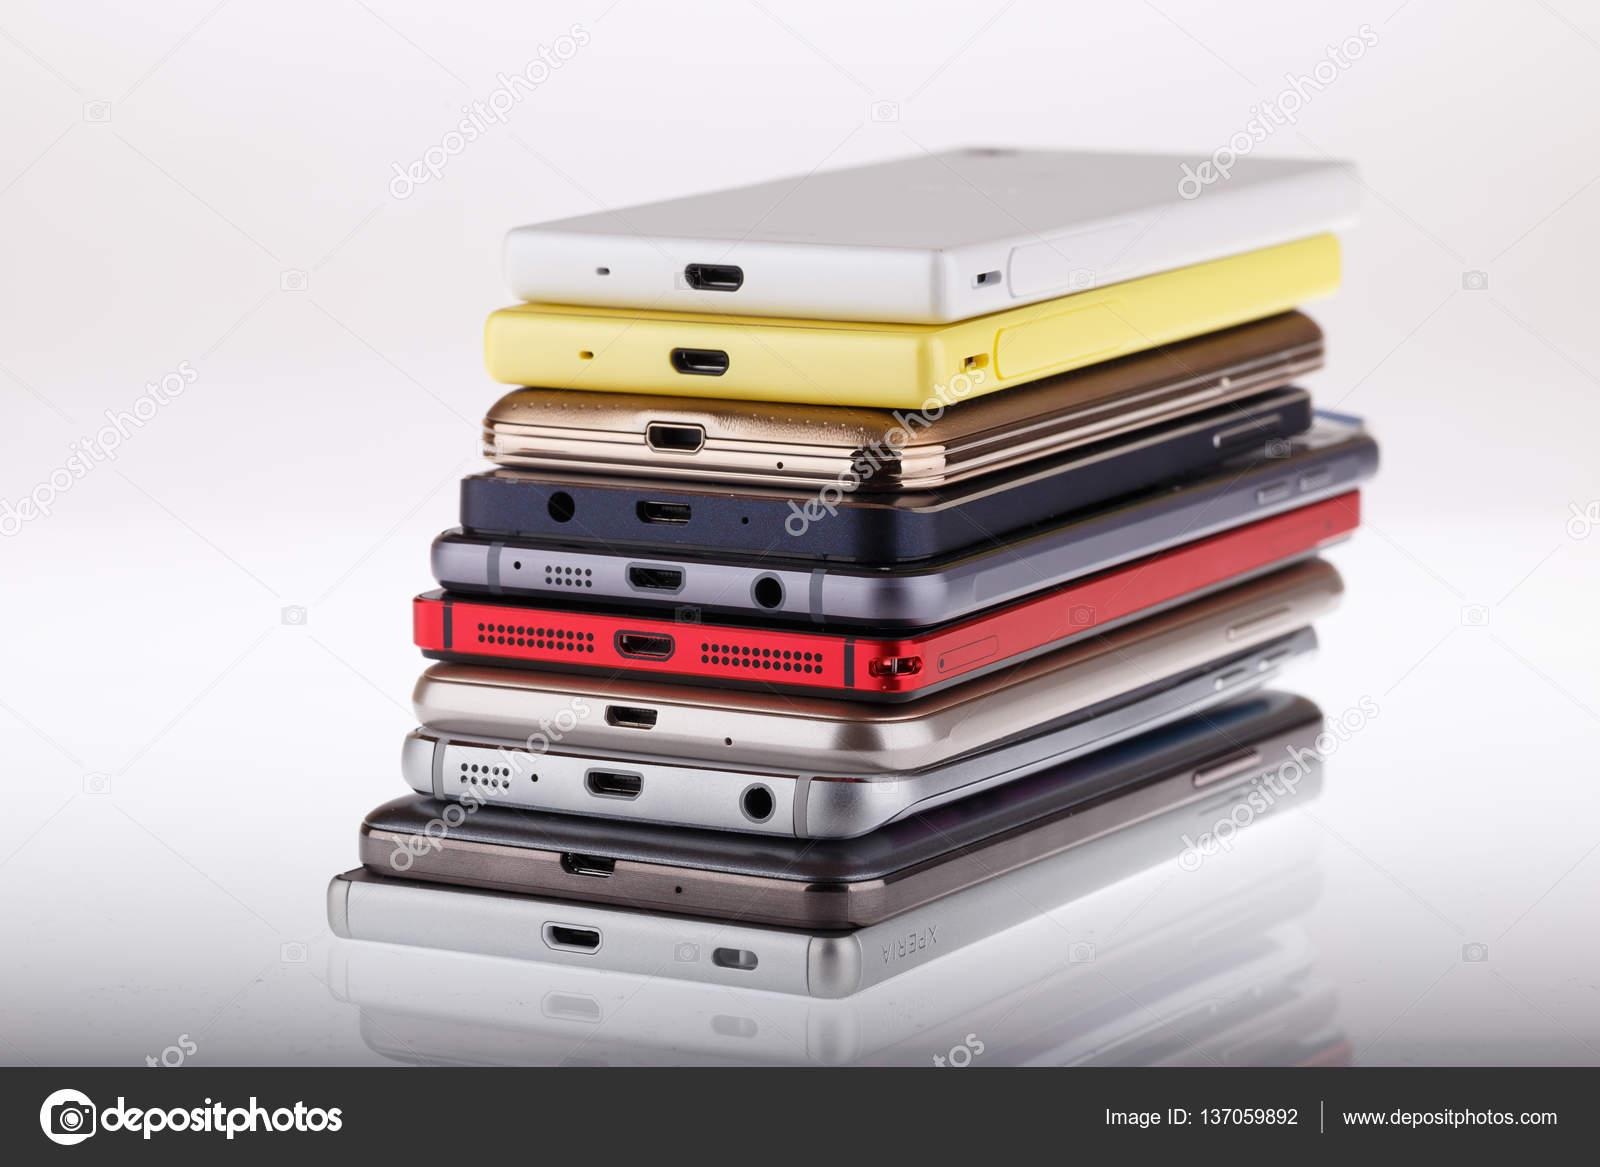 Handy-drahtlose Kommunikationstechnologie - smartphones — Stockfoto ...